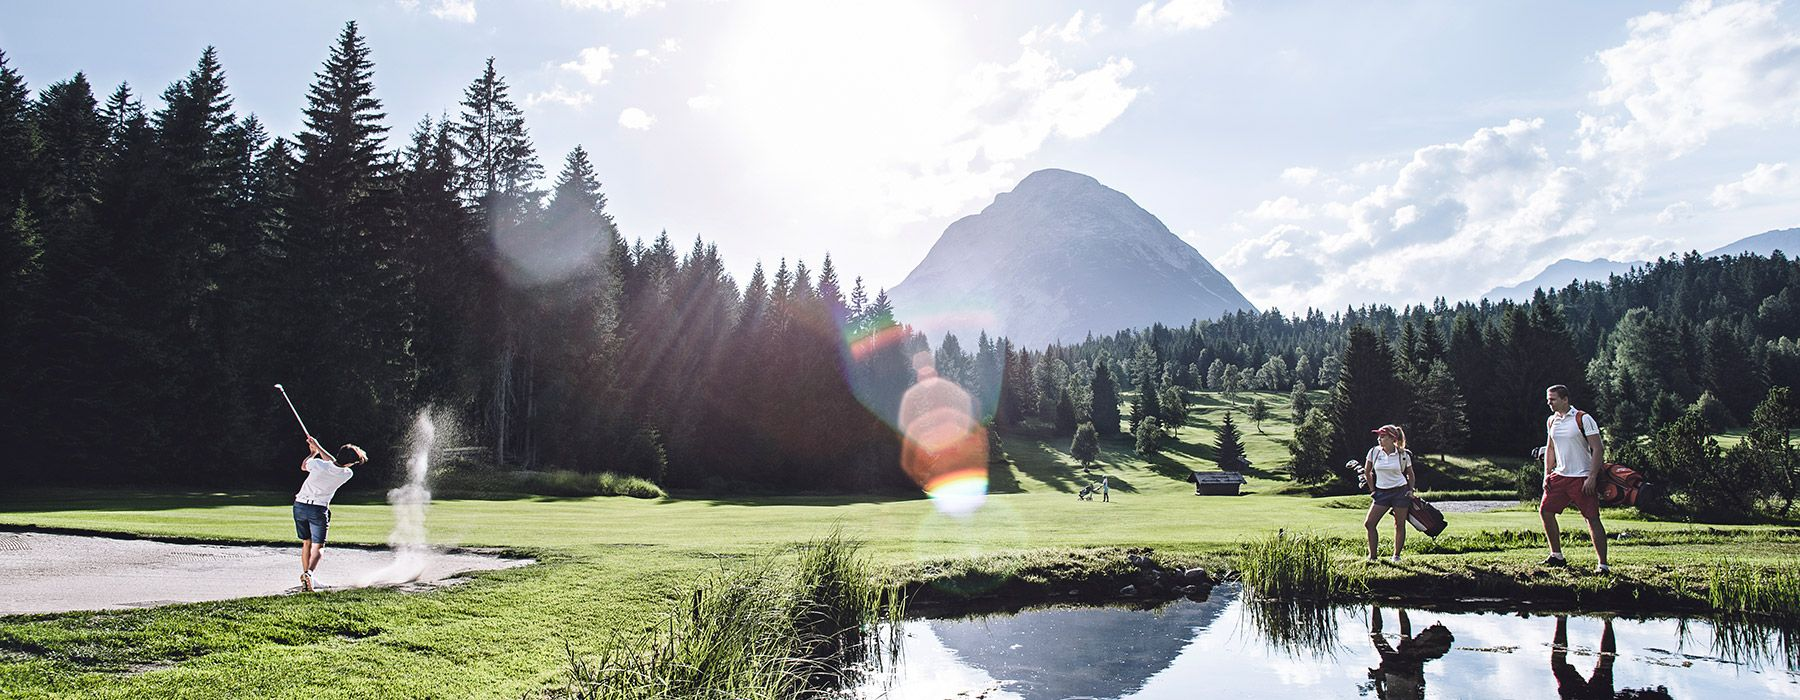 Golfen in Seefeld in Tirol